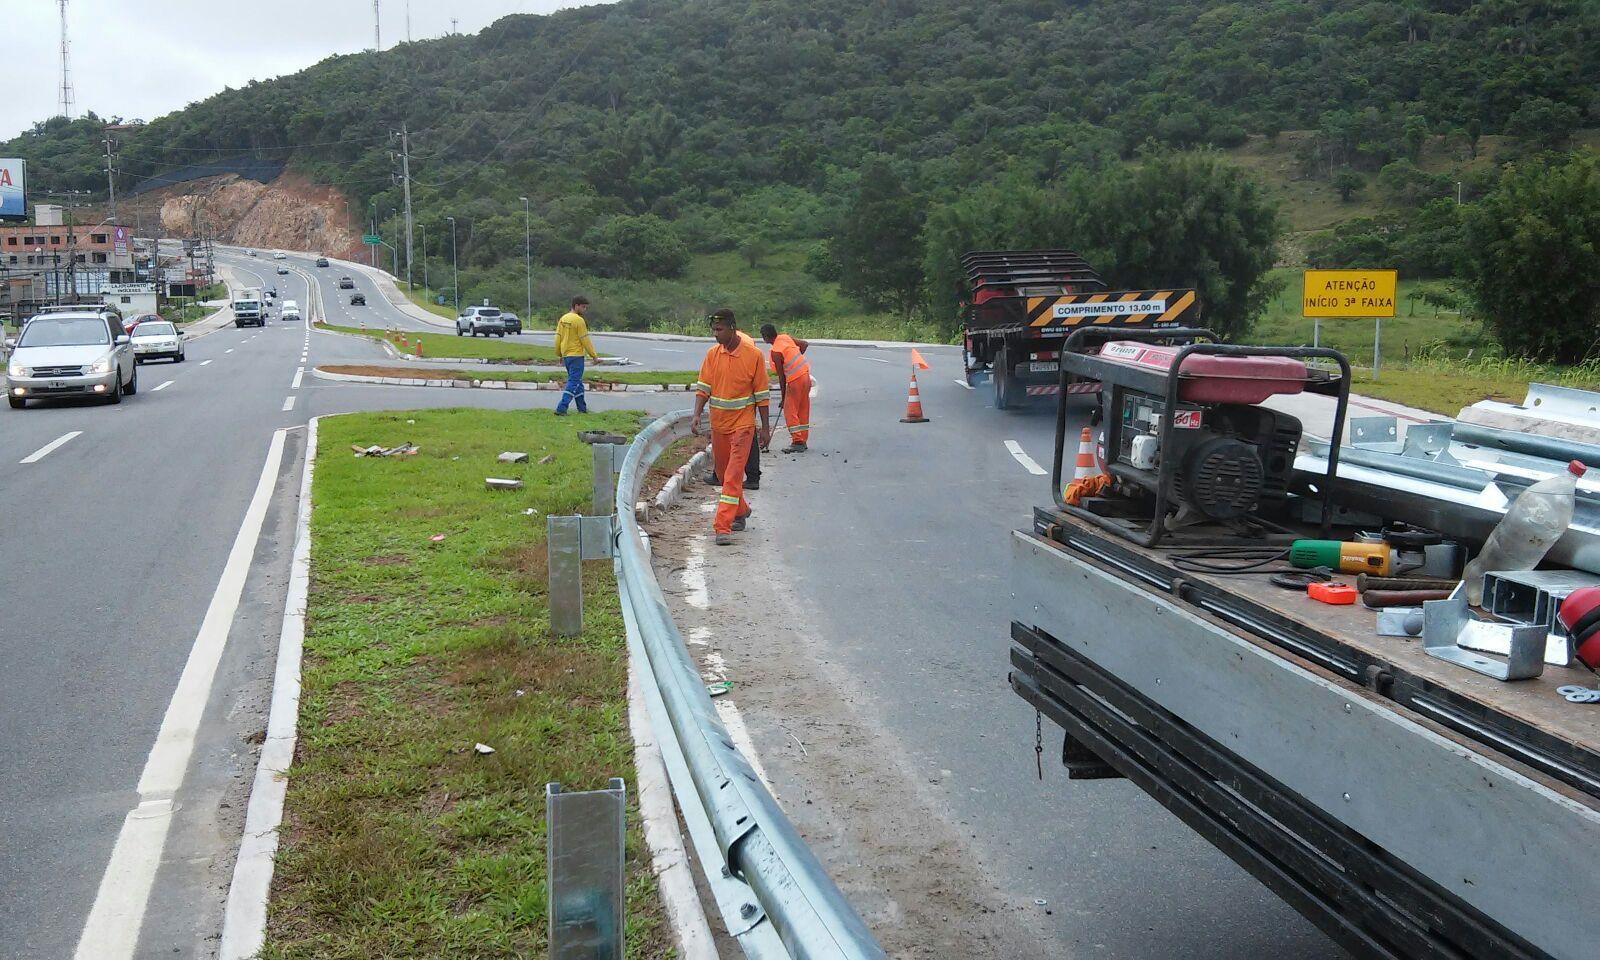 obra-sc403-defesa-guard-rail-rodovia